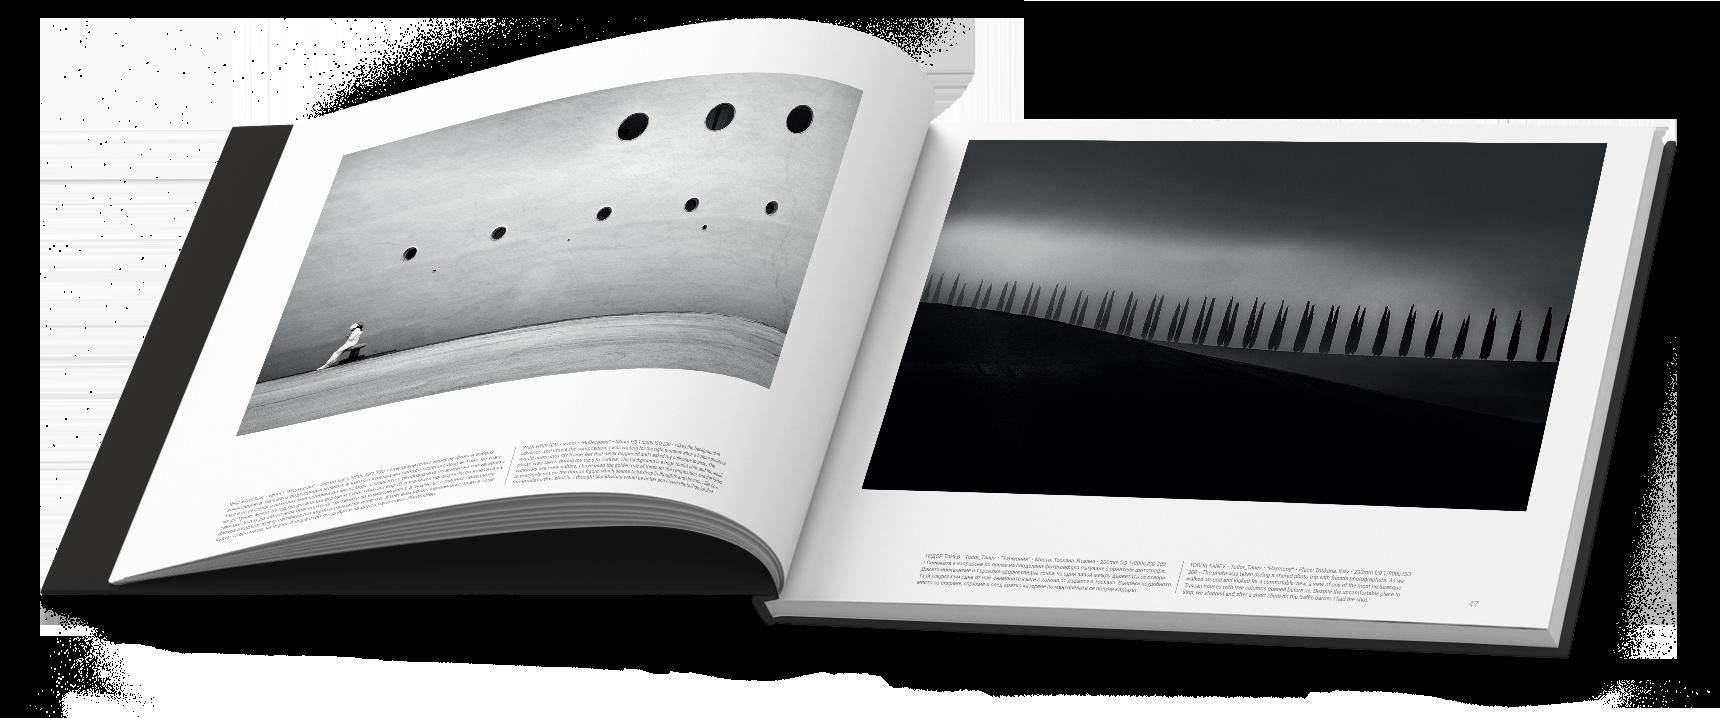 Фотографски Албум 2018 г. - Black&White &Color - страници 46-47